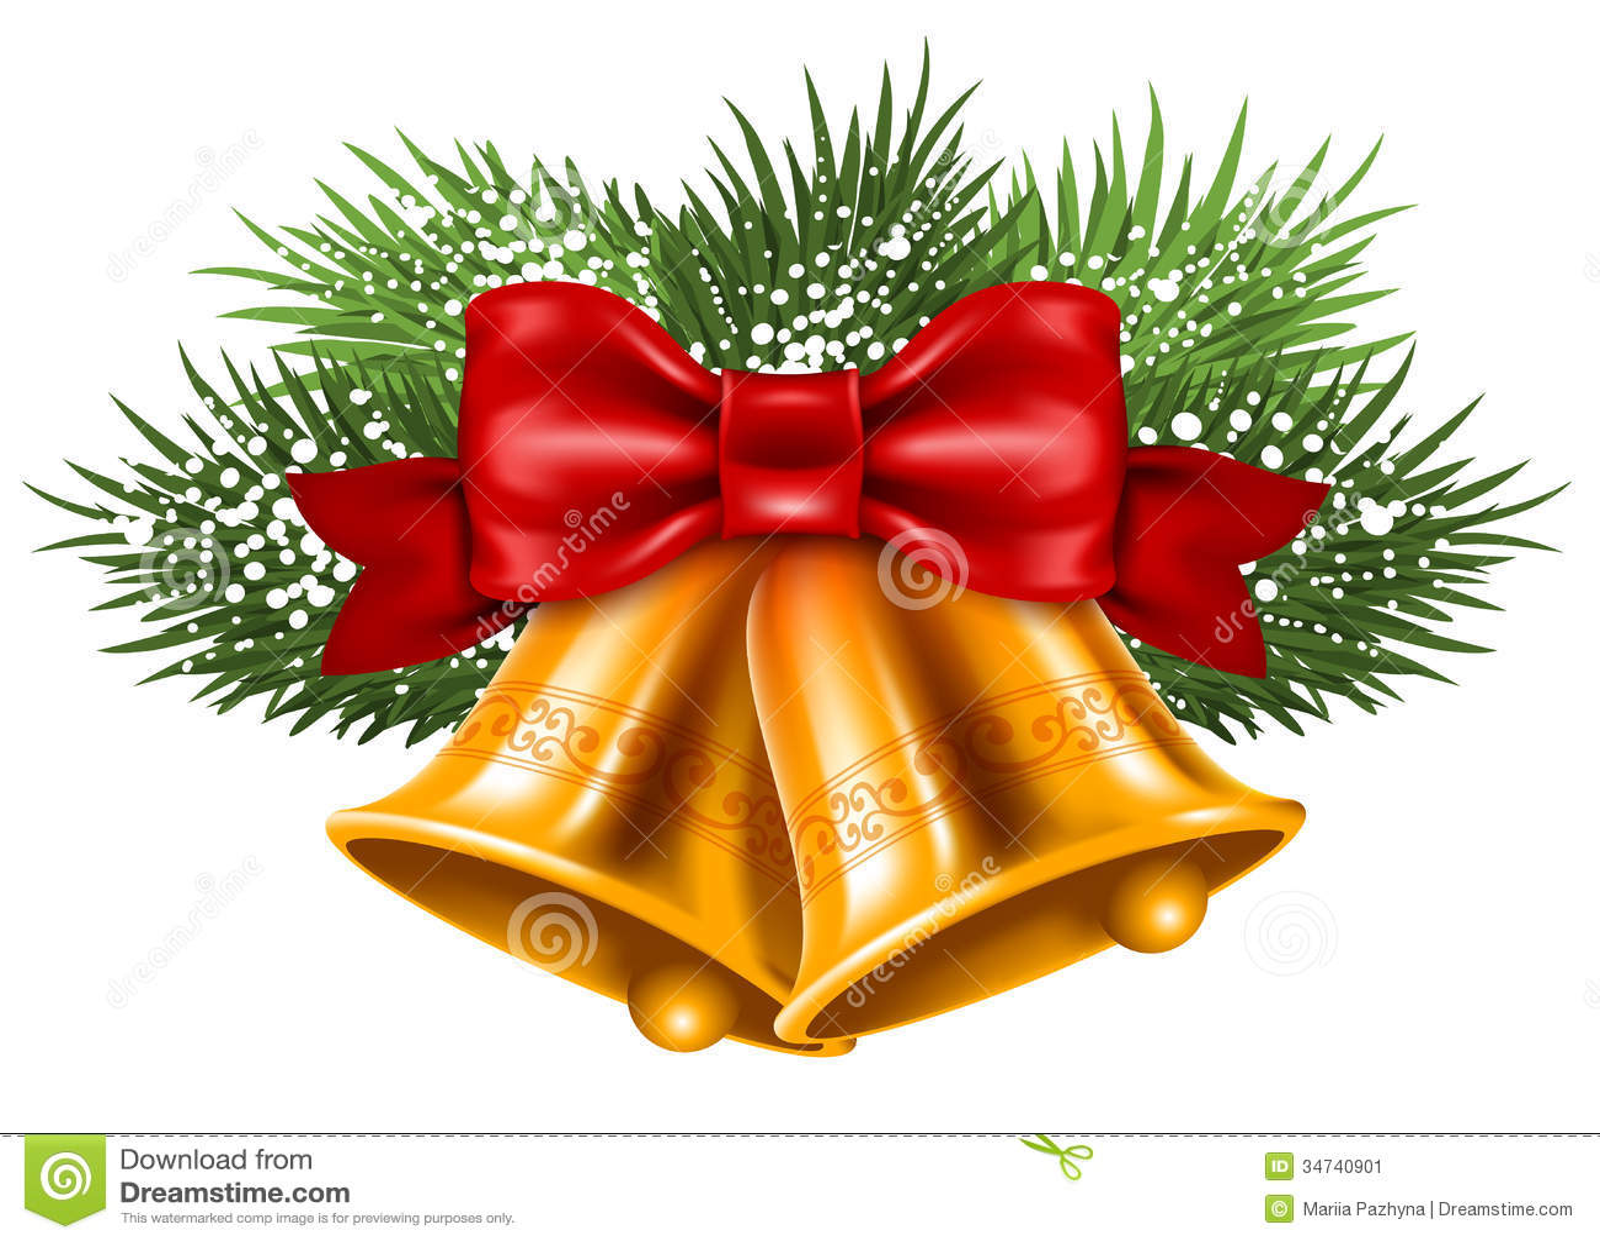 christmas bells stock vector image of object season. Black Bedroom Furniture Sets. Home Design Ideas